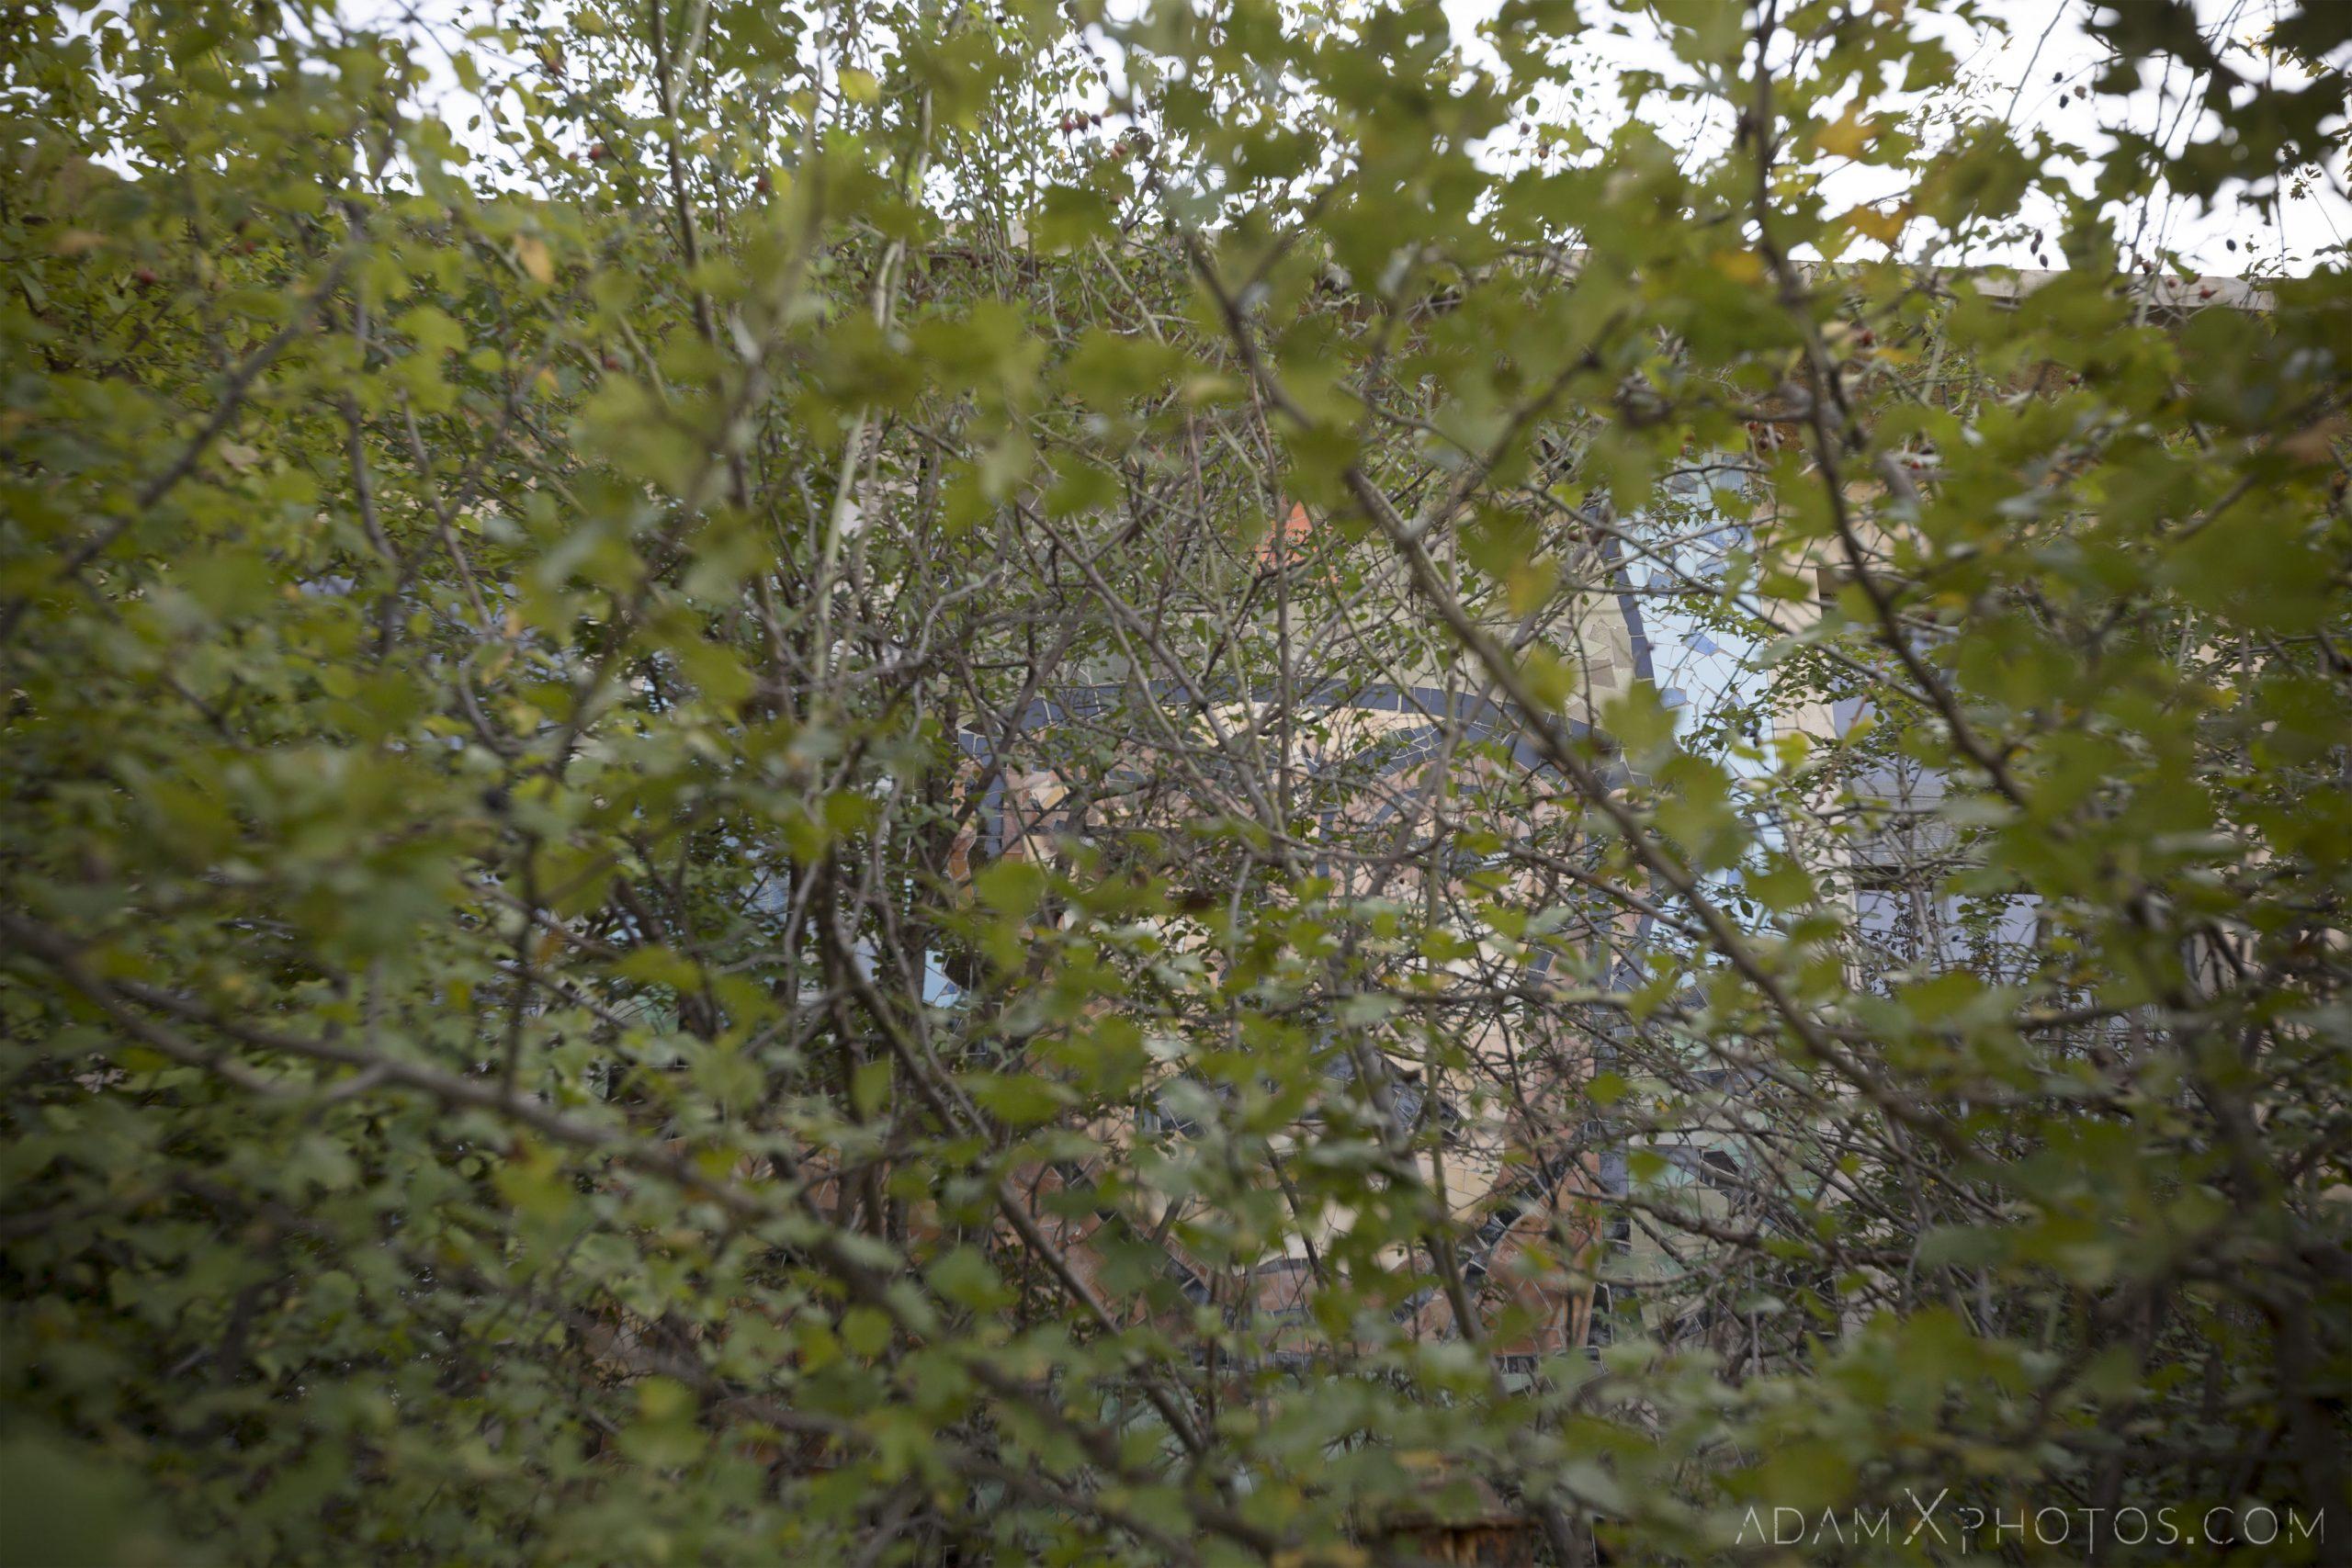 overgrown World War ii 2 memorial mural empty abandoned rural Soviet era Georgia Adam X AdamXPhotos Urbex Urban Exploration 2018 2019 Abandoned Access History decay ruins lost forgotten derelict location creepy haunting eerie security